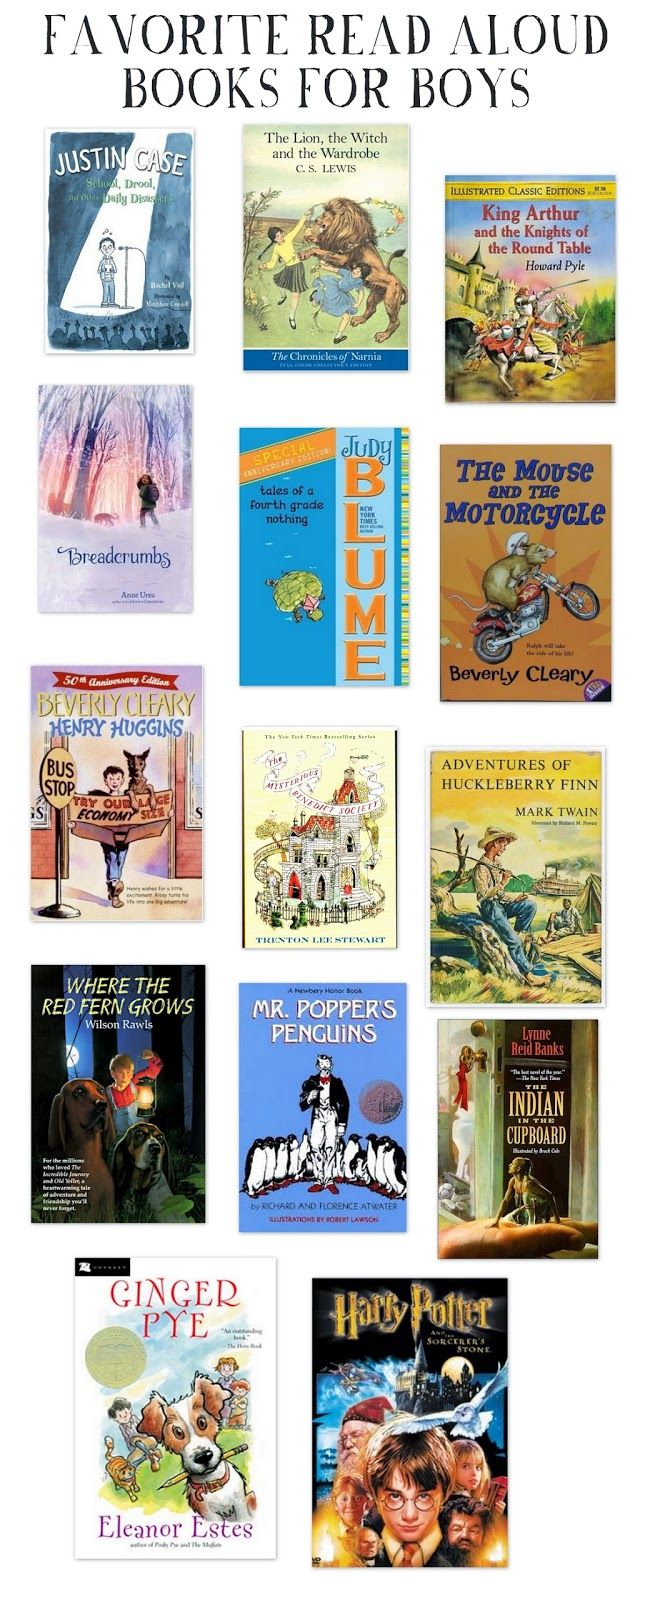 My Favorite Books to Read Aloud to Boys - Nine Sixteen